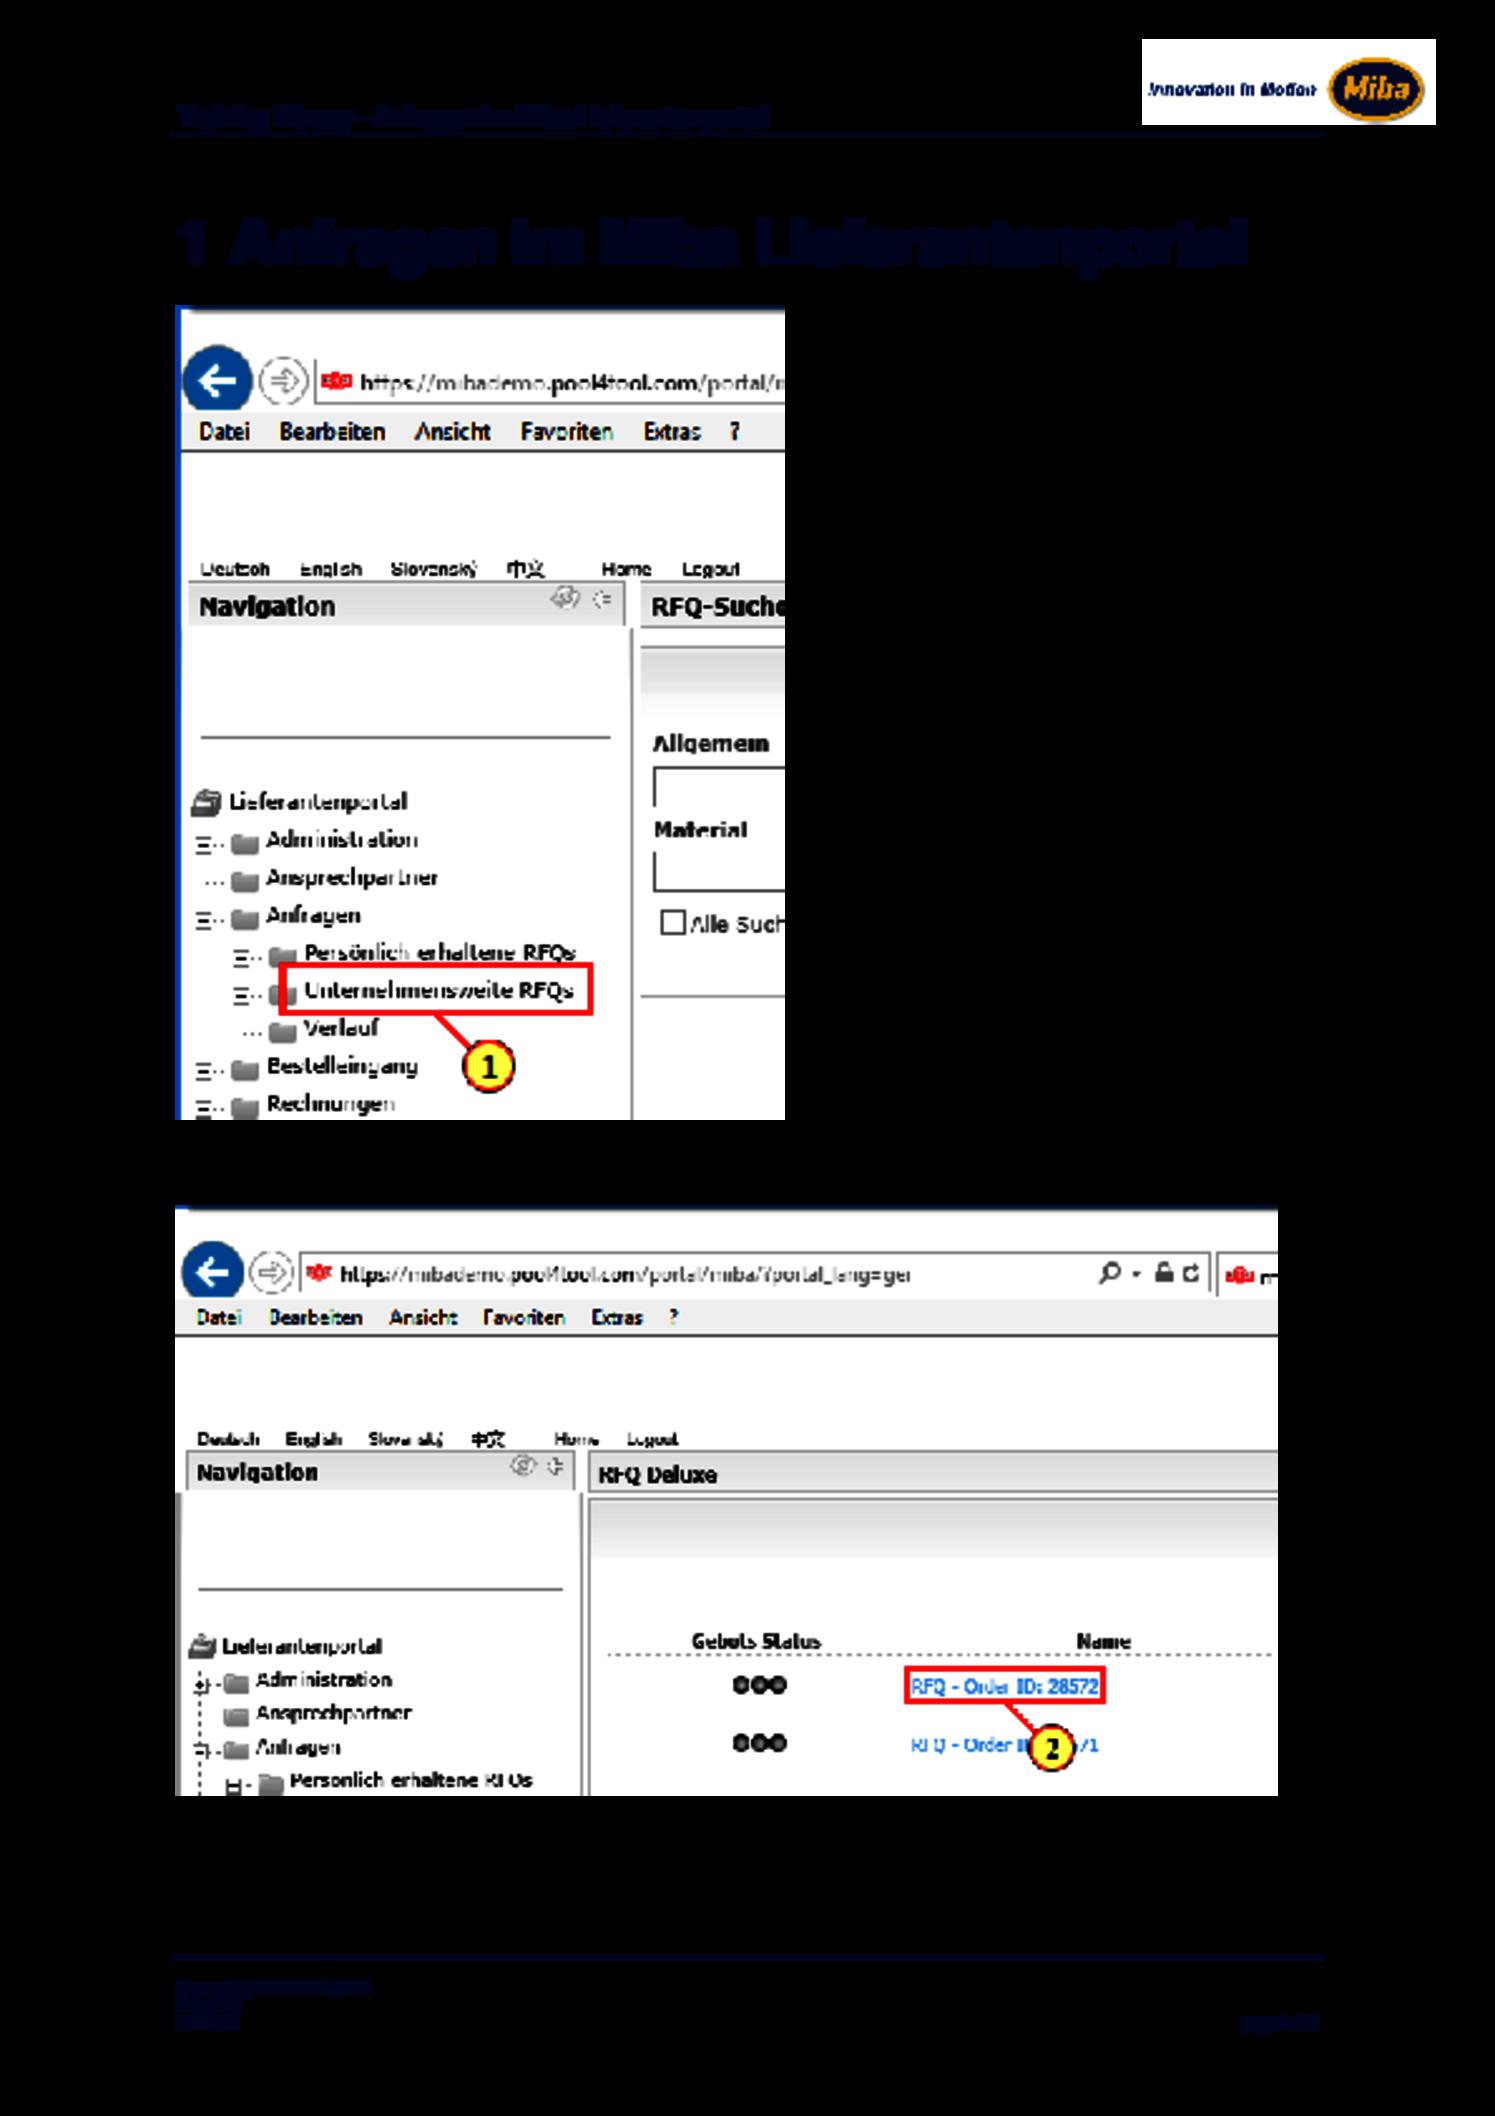 Pool4Tool: Anfragen im Miba Lieferantenportal